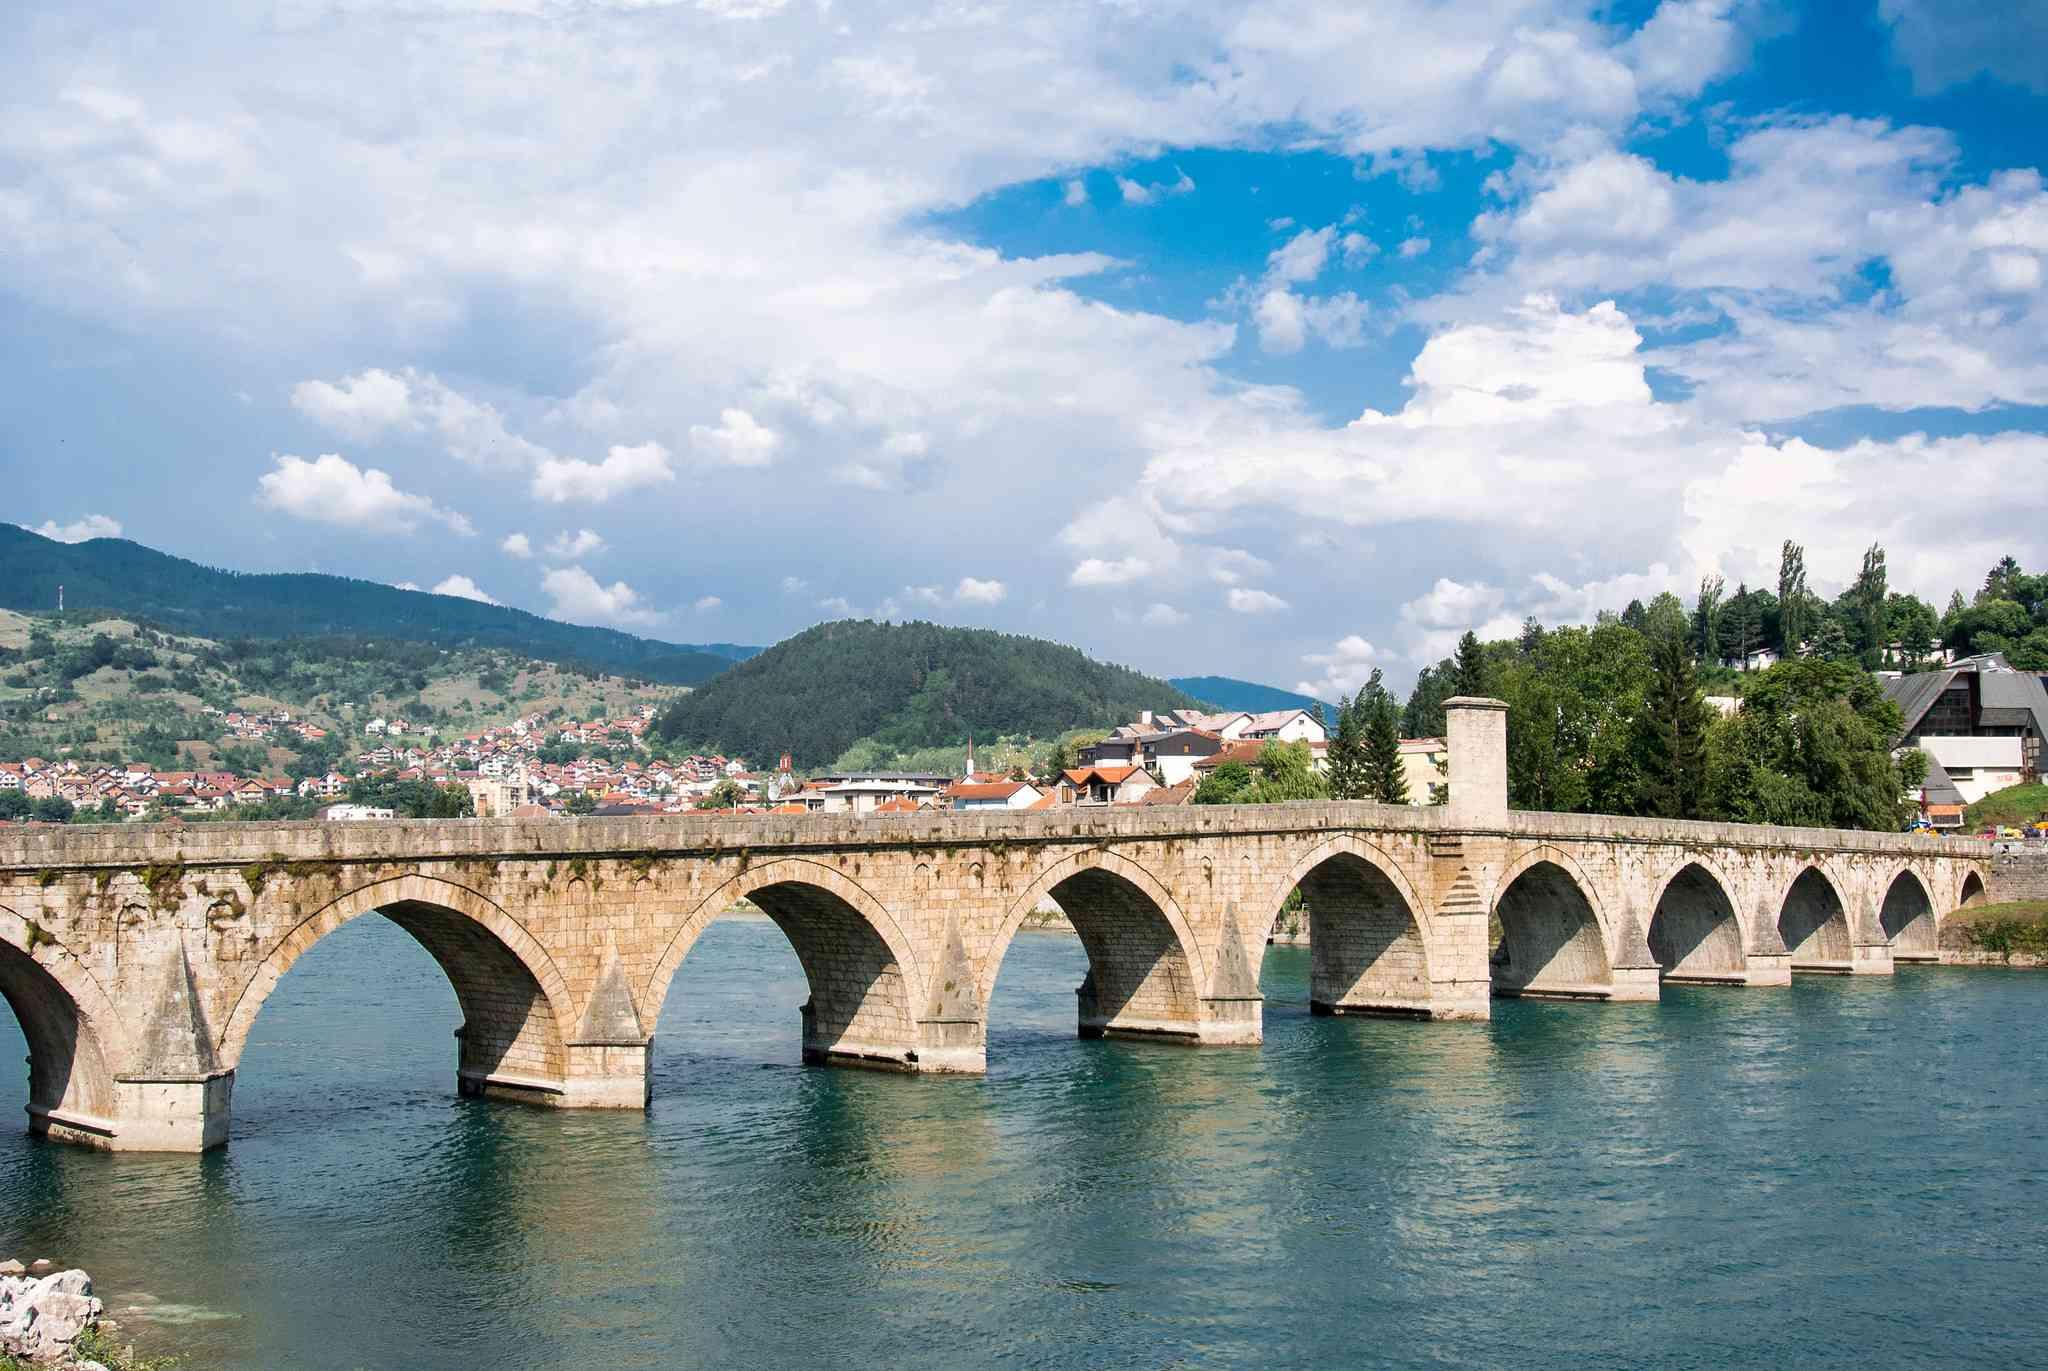 The town of Višegrad in Bosnia where Vilina Vlas Hotel is